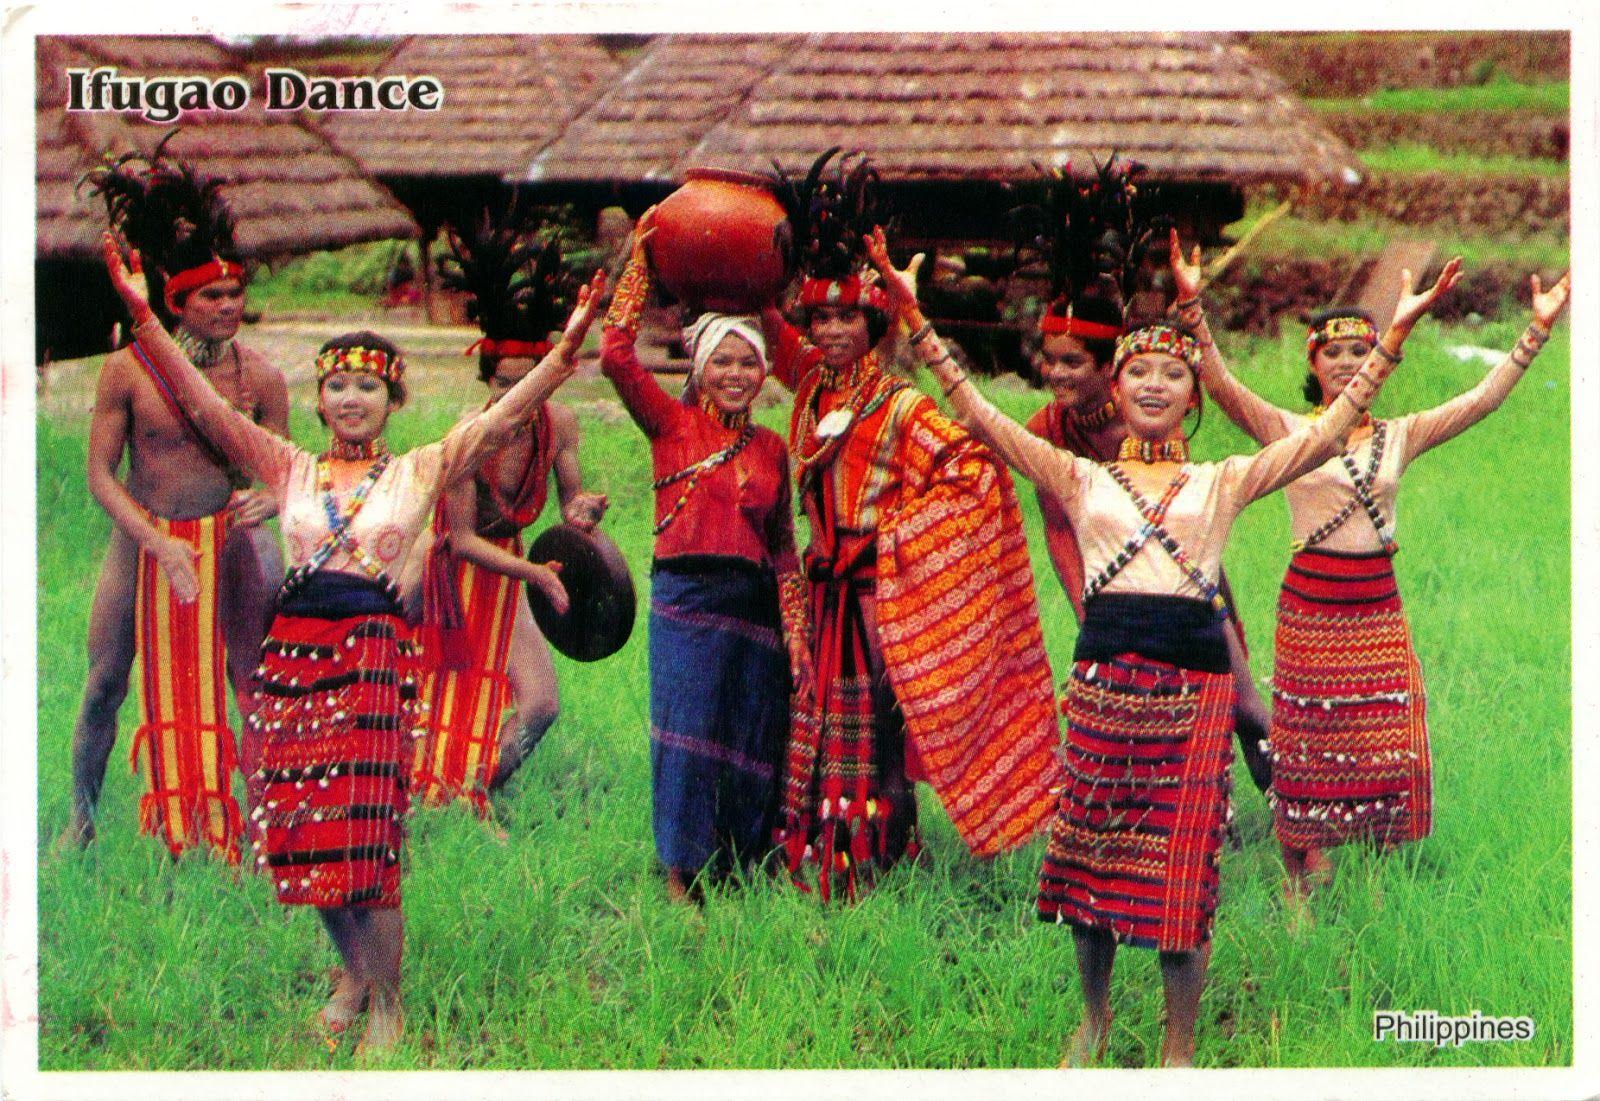 (Cordillera Administrative Region) An Ifugao dance